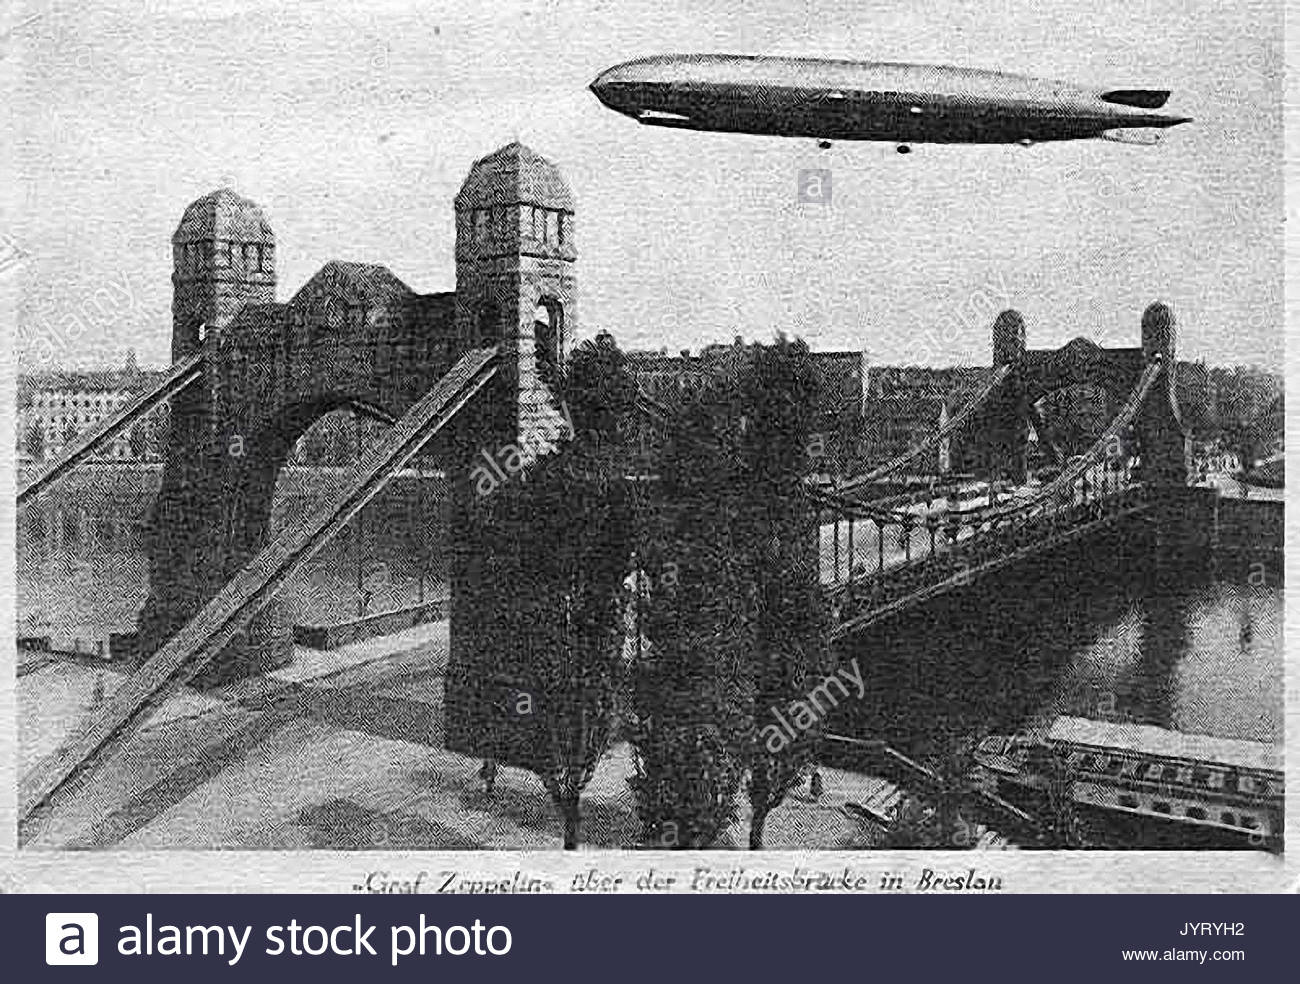 https://c8.alamy.com/comp/JYRYH2/old-photograph-showing-graf-zeppelin-flying-over-breslau-in-germany-JYRYH2.jpg